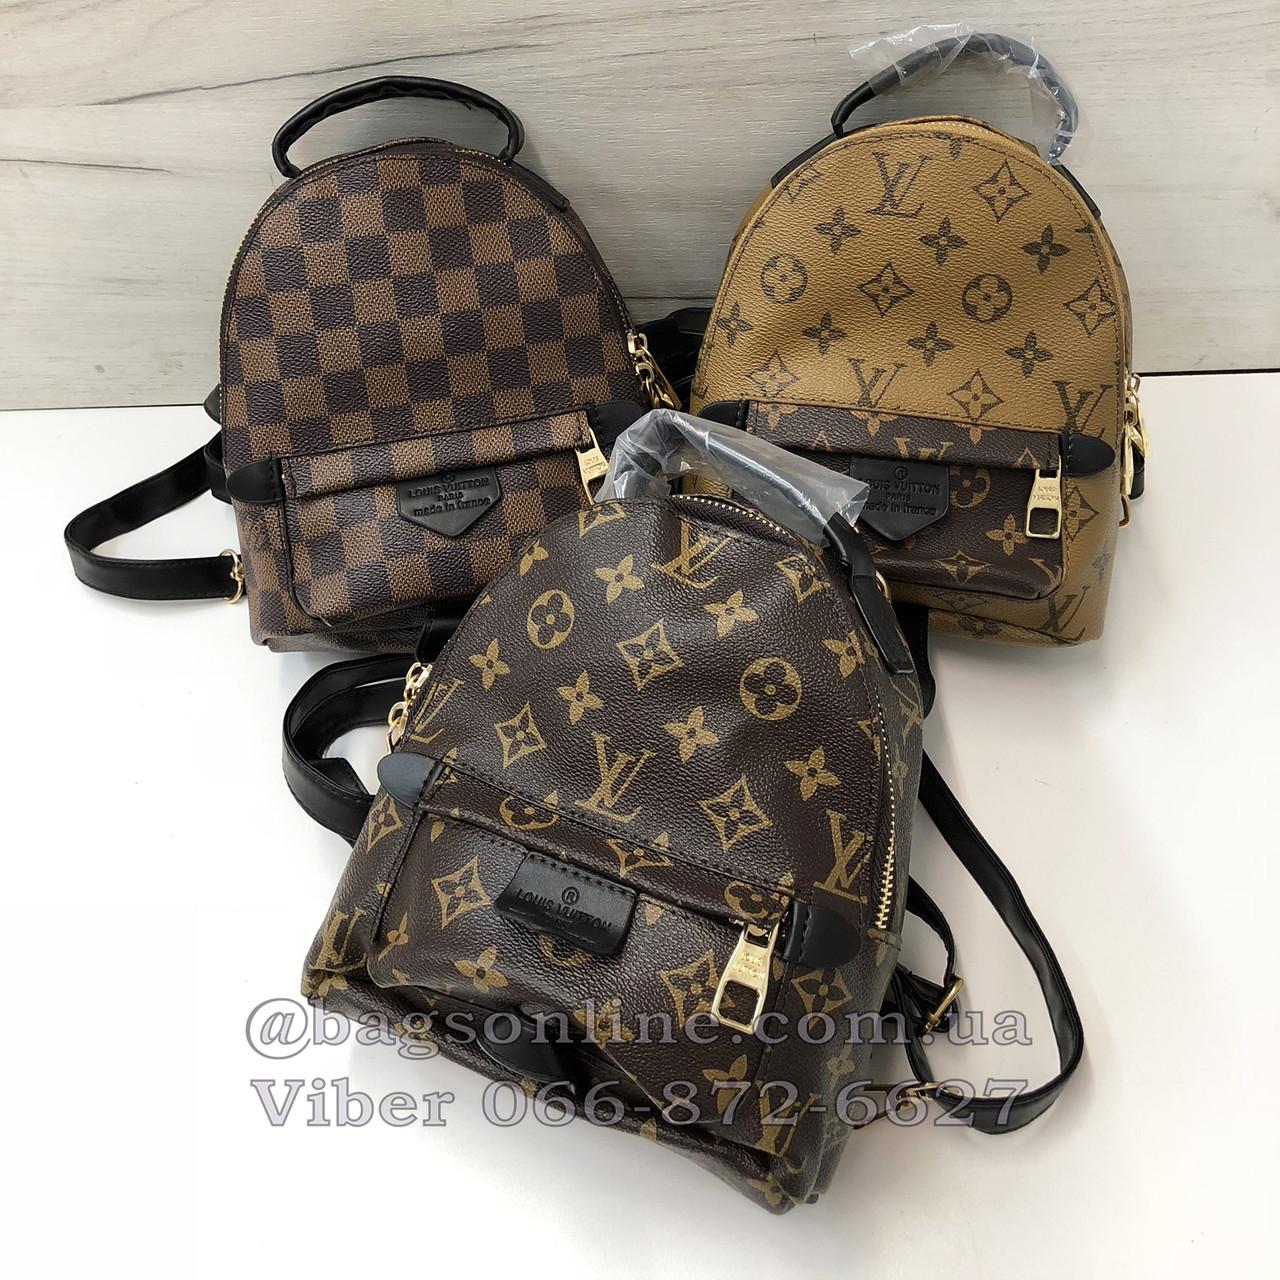 6a7e6de1c7c5 Мини портфель Louis Vuitton   рюкзак луи виттон   lv лв квадрат Коричневый  - BagsOnline -